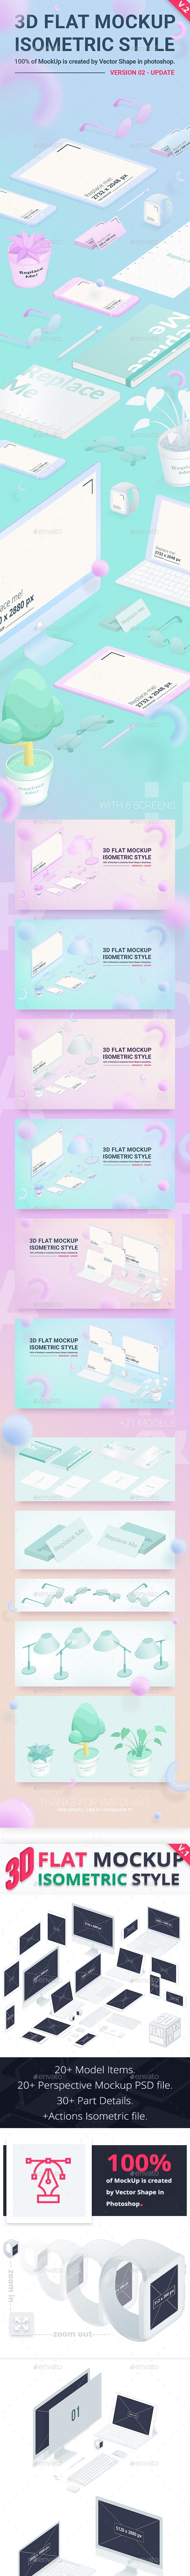 3D Flat Mockup Screen - Isometric -Version 2 - Product Mock-Ups Graphics